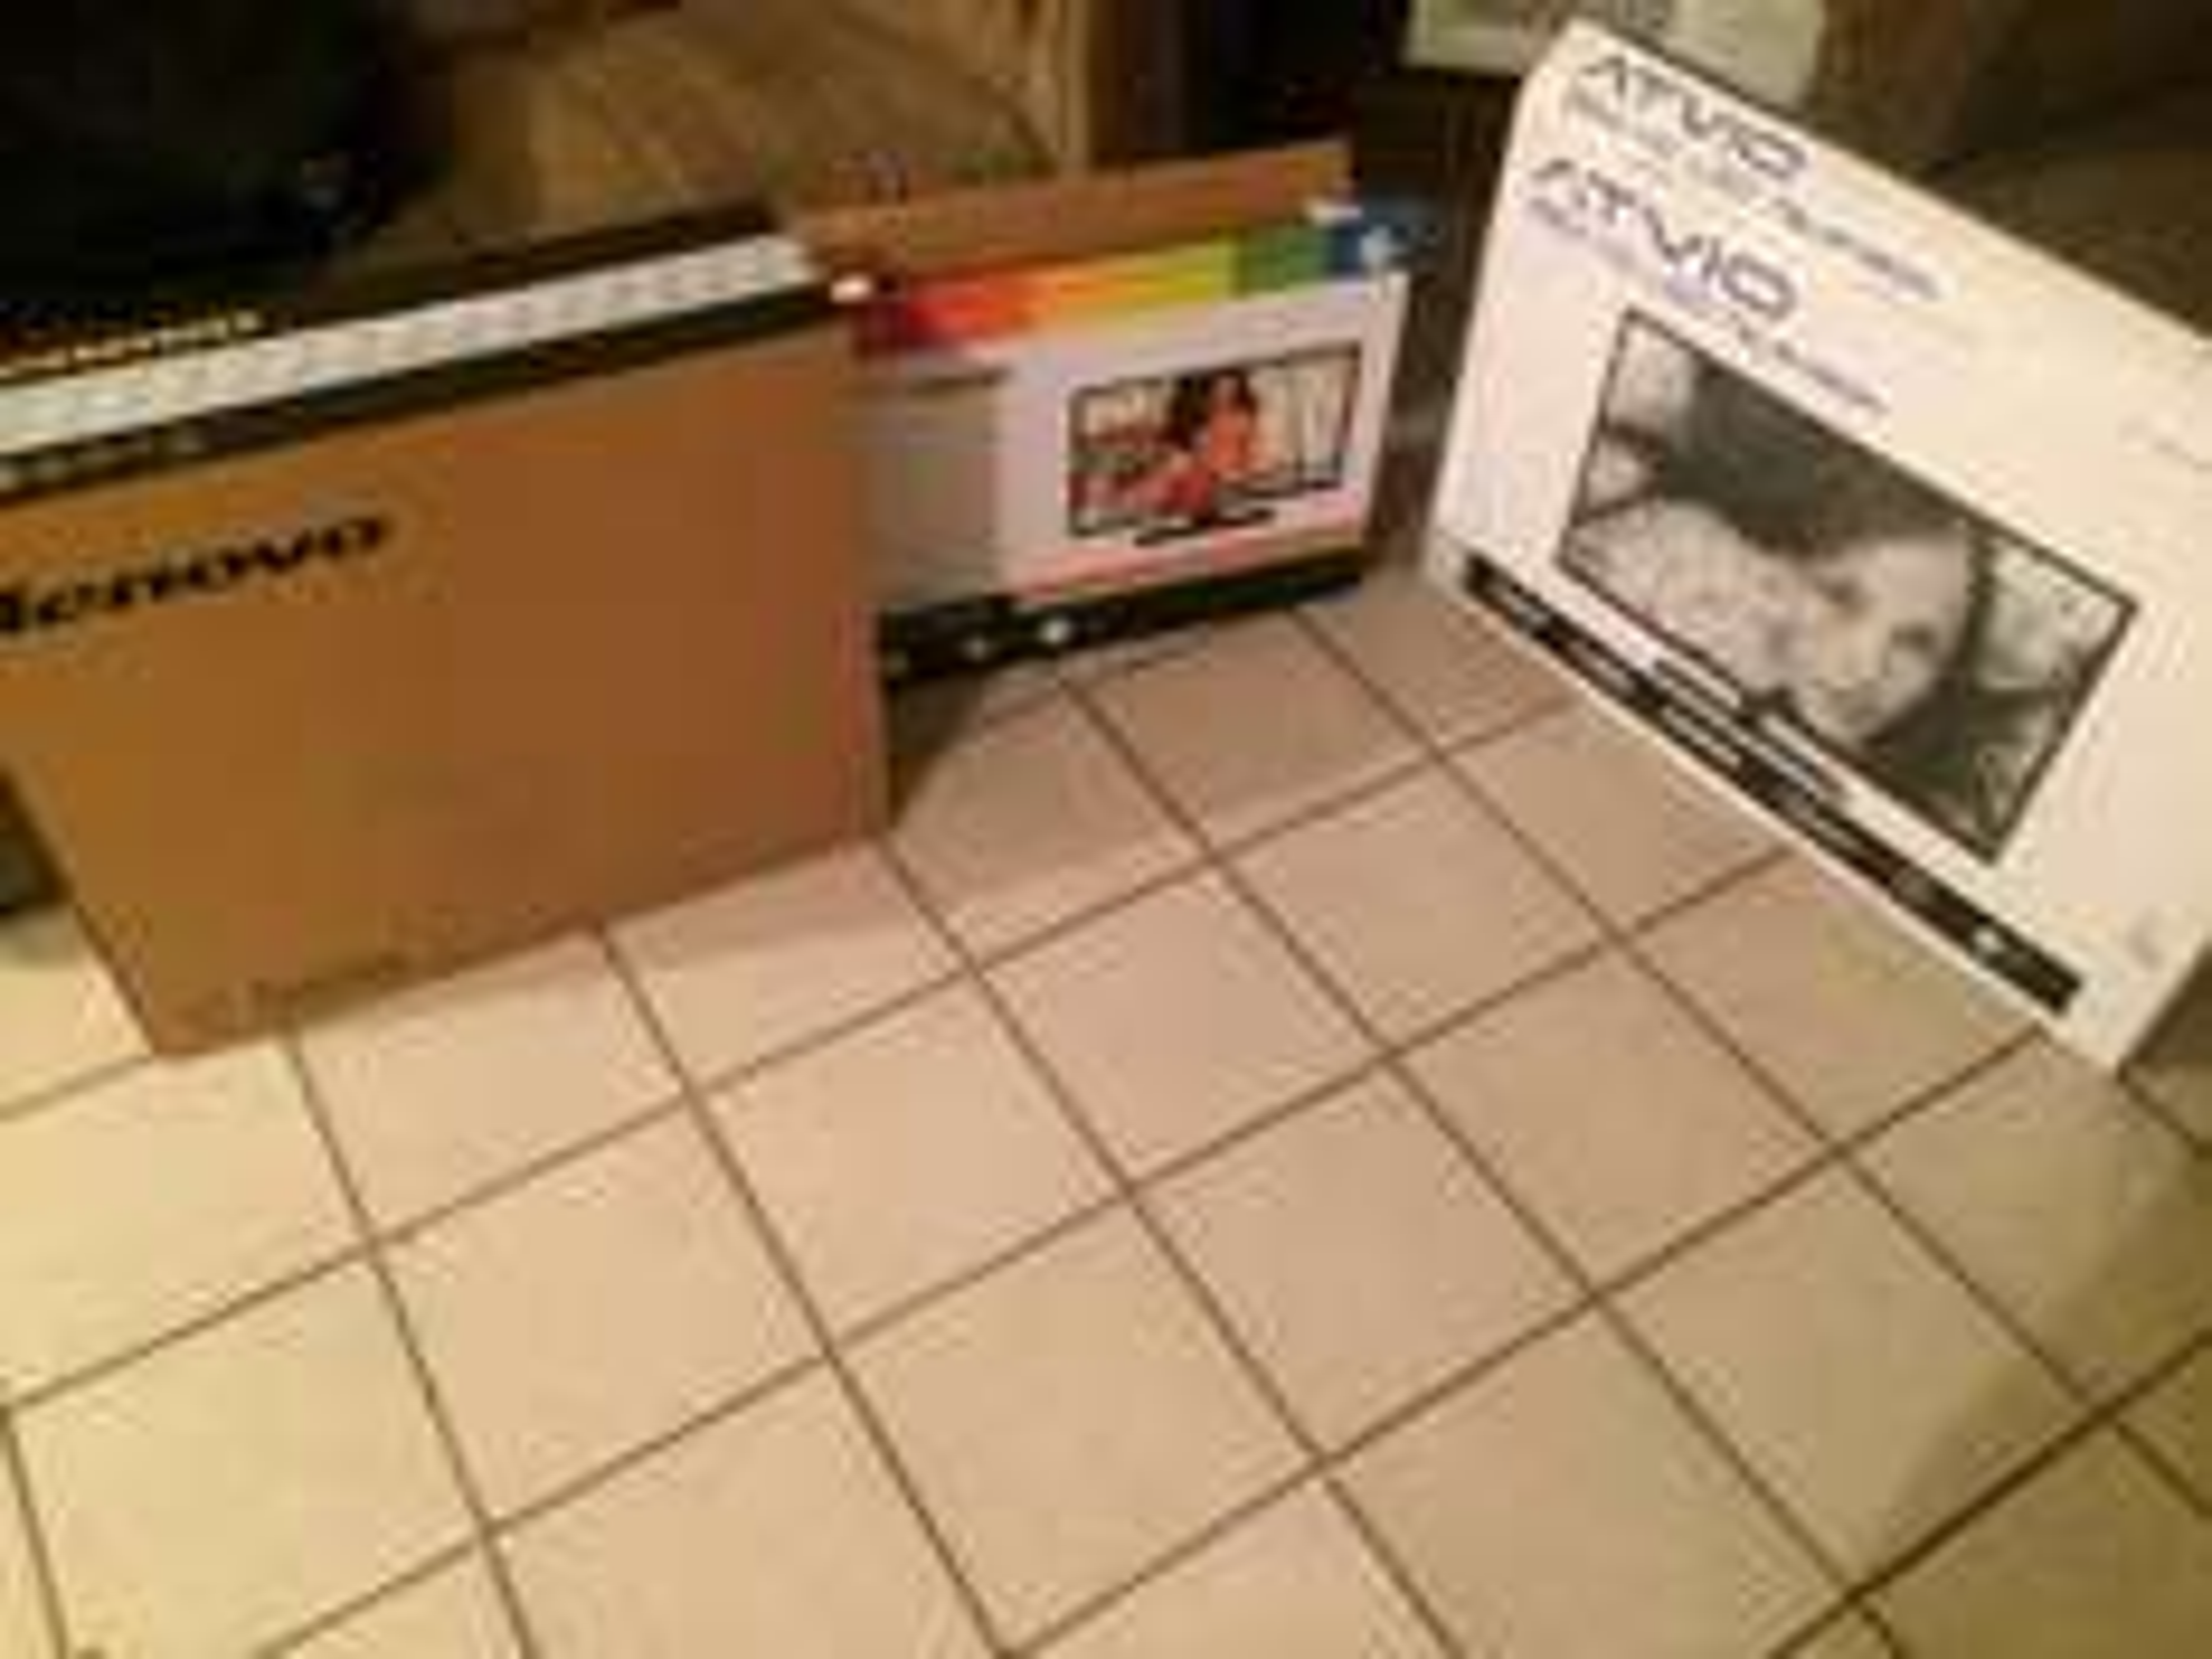 Walmart: Lenovo c40-30 a 4899.01 + tv 22 pulgadas marca polaroid 999.01 + TV ATVIO 32 pulgadas a 1999.02